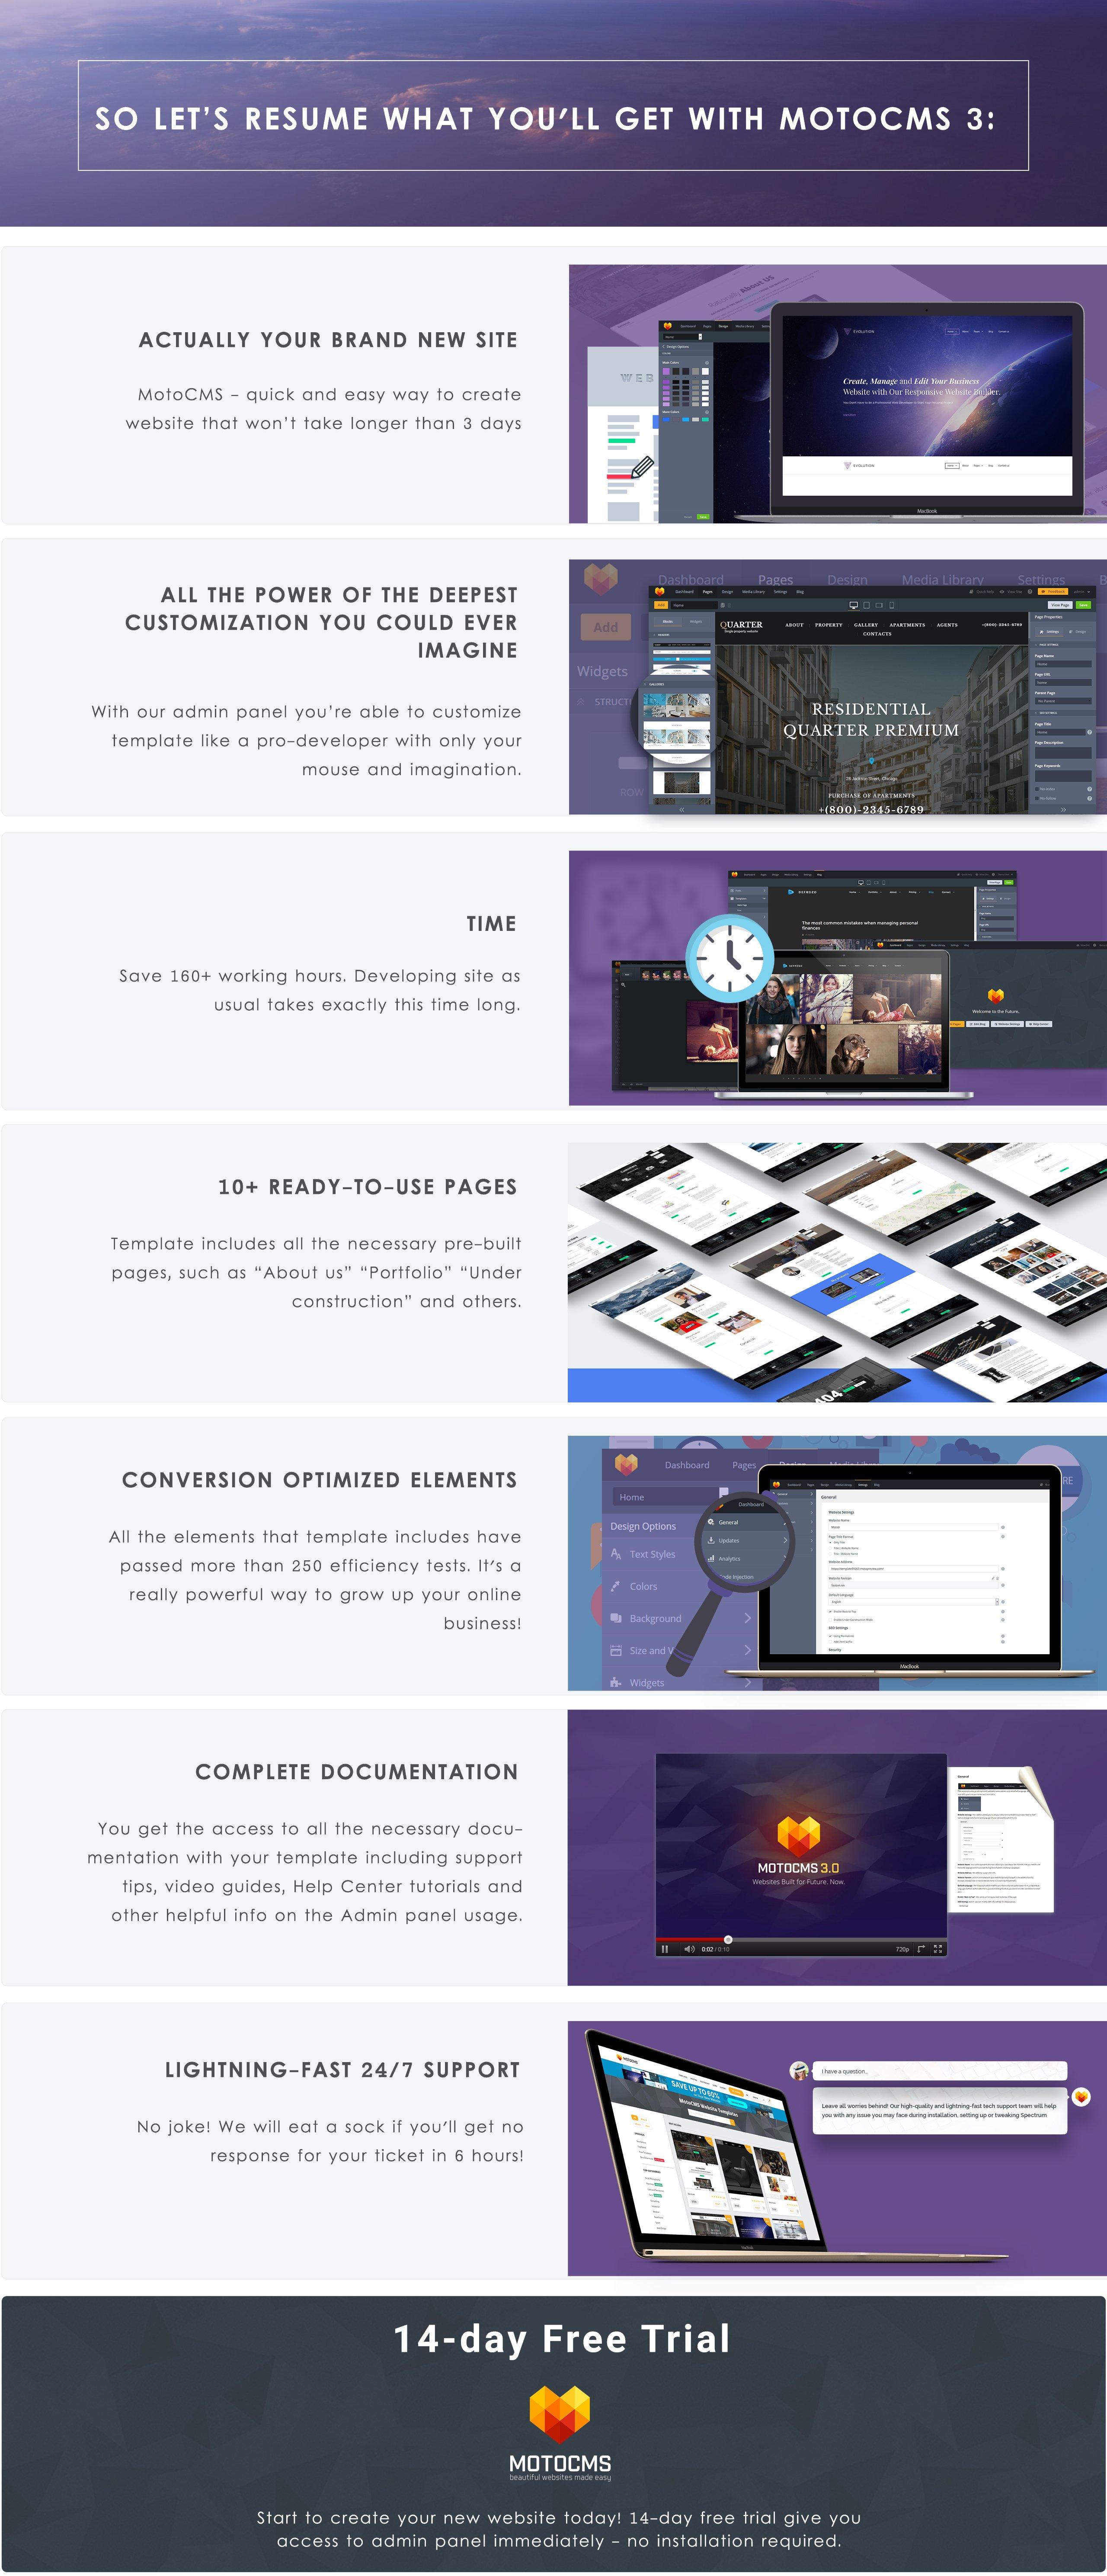 HousePress - Publishing Company Moto CMS 3 Template